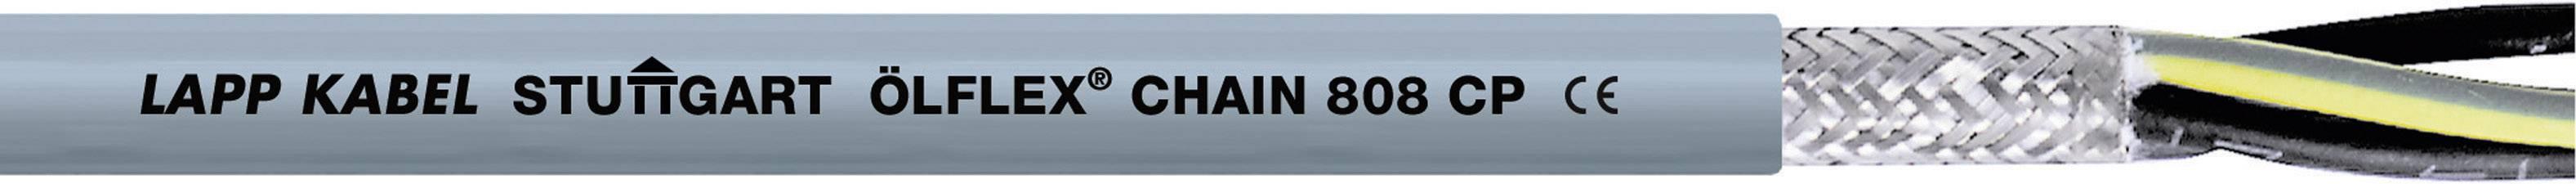 Žíla kabelu LappKabel ÖLFLEX CHAIN 808 CP 7G0,75 (1027763), 7x 0,75 mm², polyurethan, Ø 9,1 mm, stíněný, 100 m